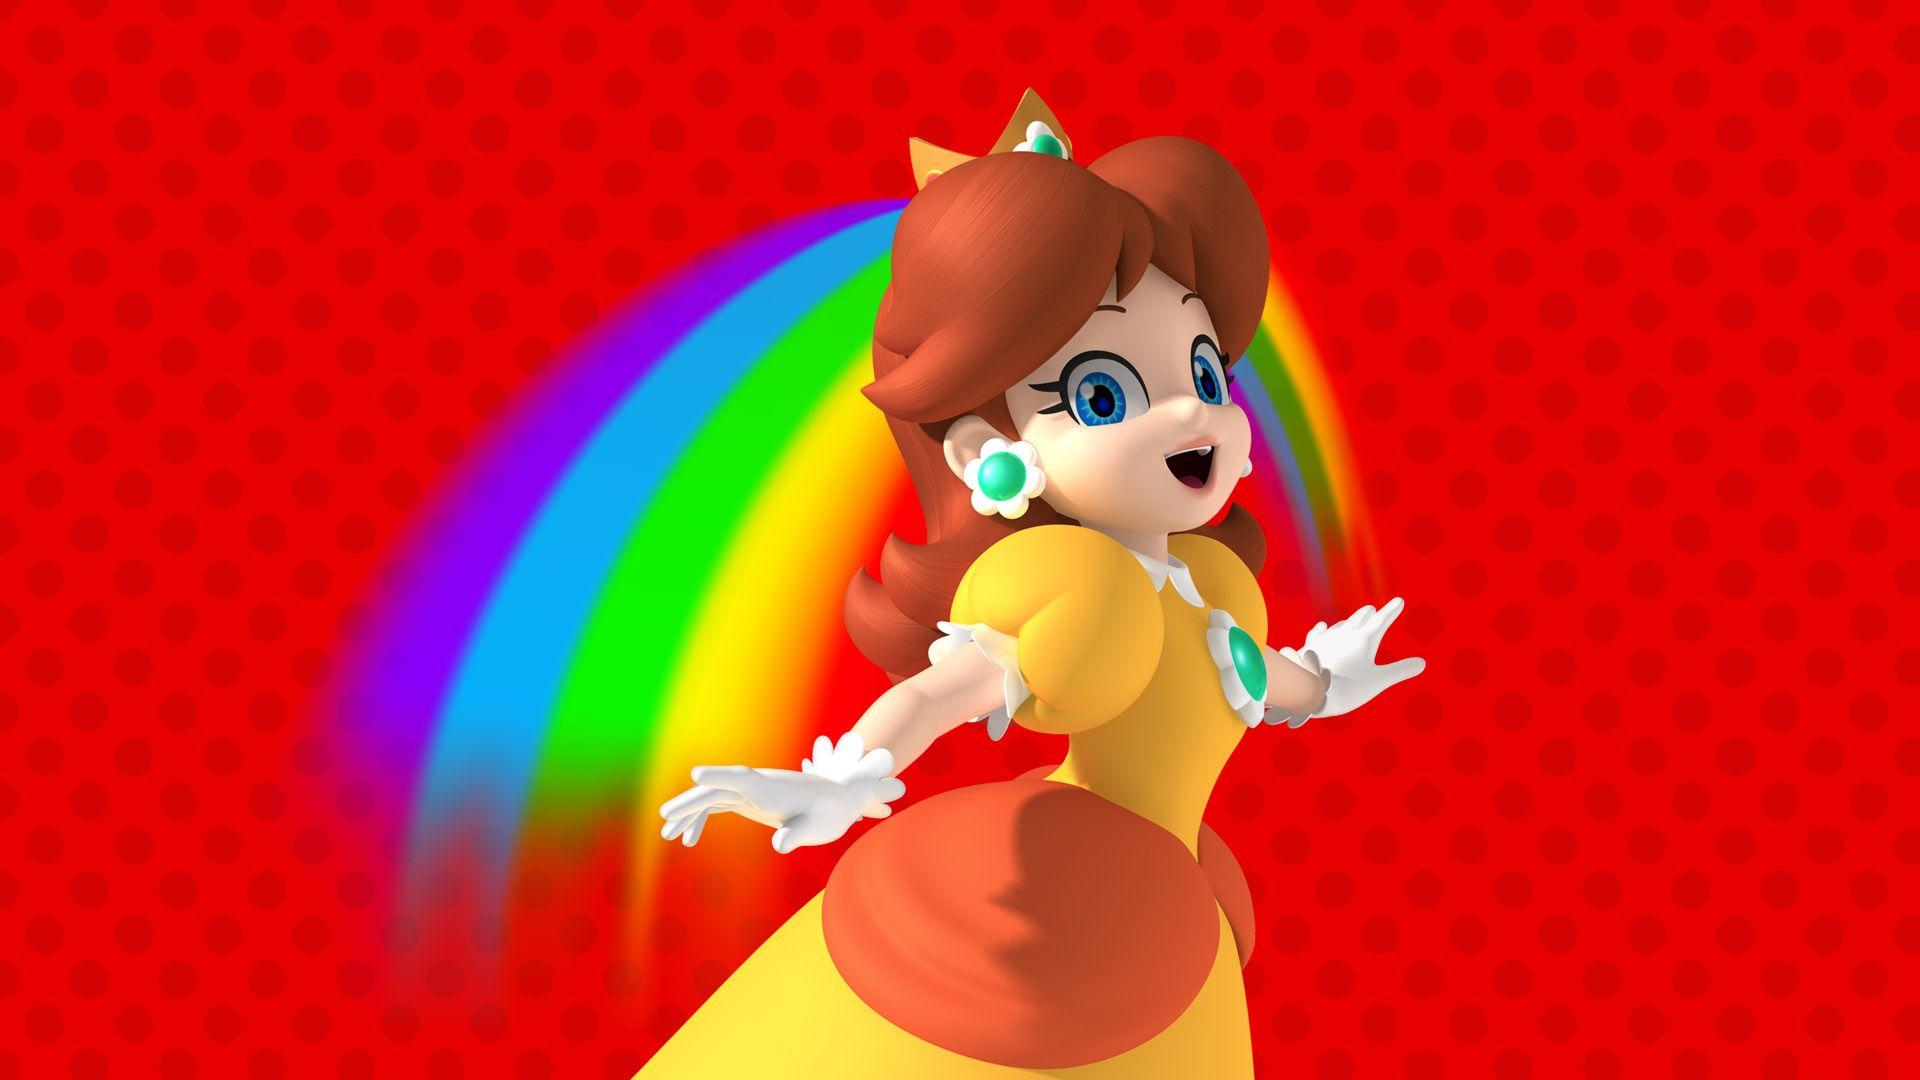 Rumor New Mode Featuring Princess Daisy Coming To Super Mario Run Princess Daisy Super Mario Run Mario Run